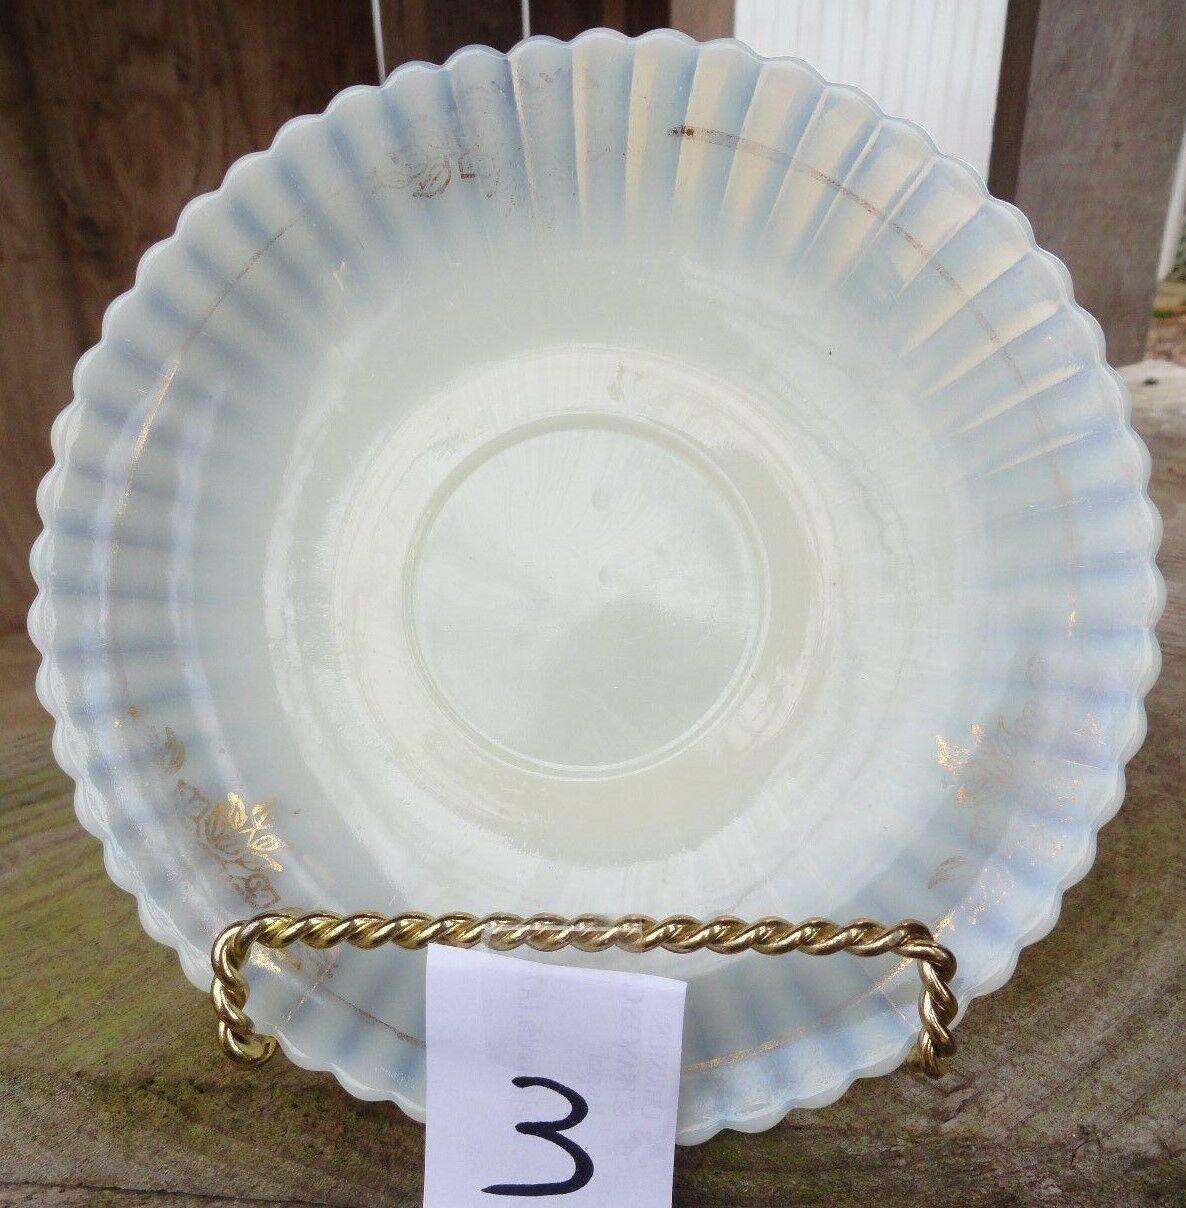 Macbeth-Evans SAUCER 5 7/8 inch Petalware opalescent white gold trim (3) - $3.22